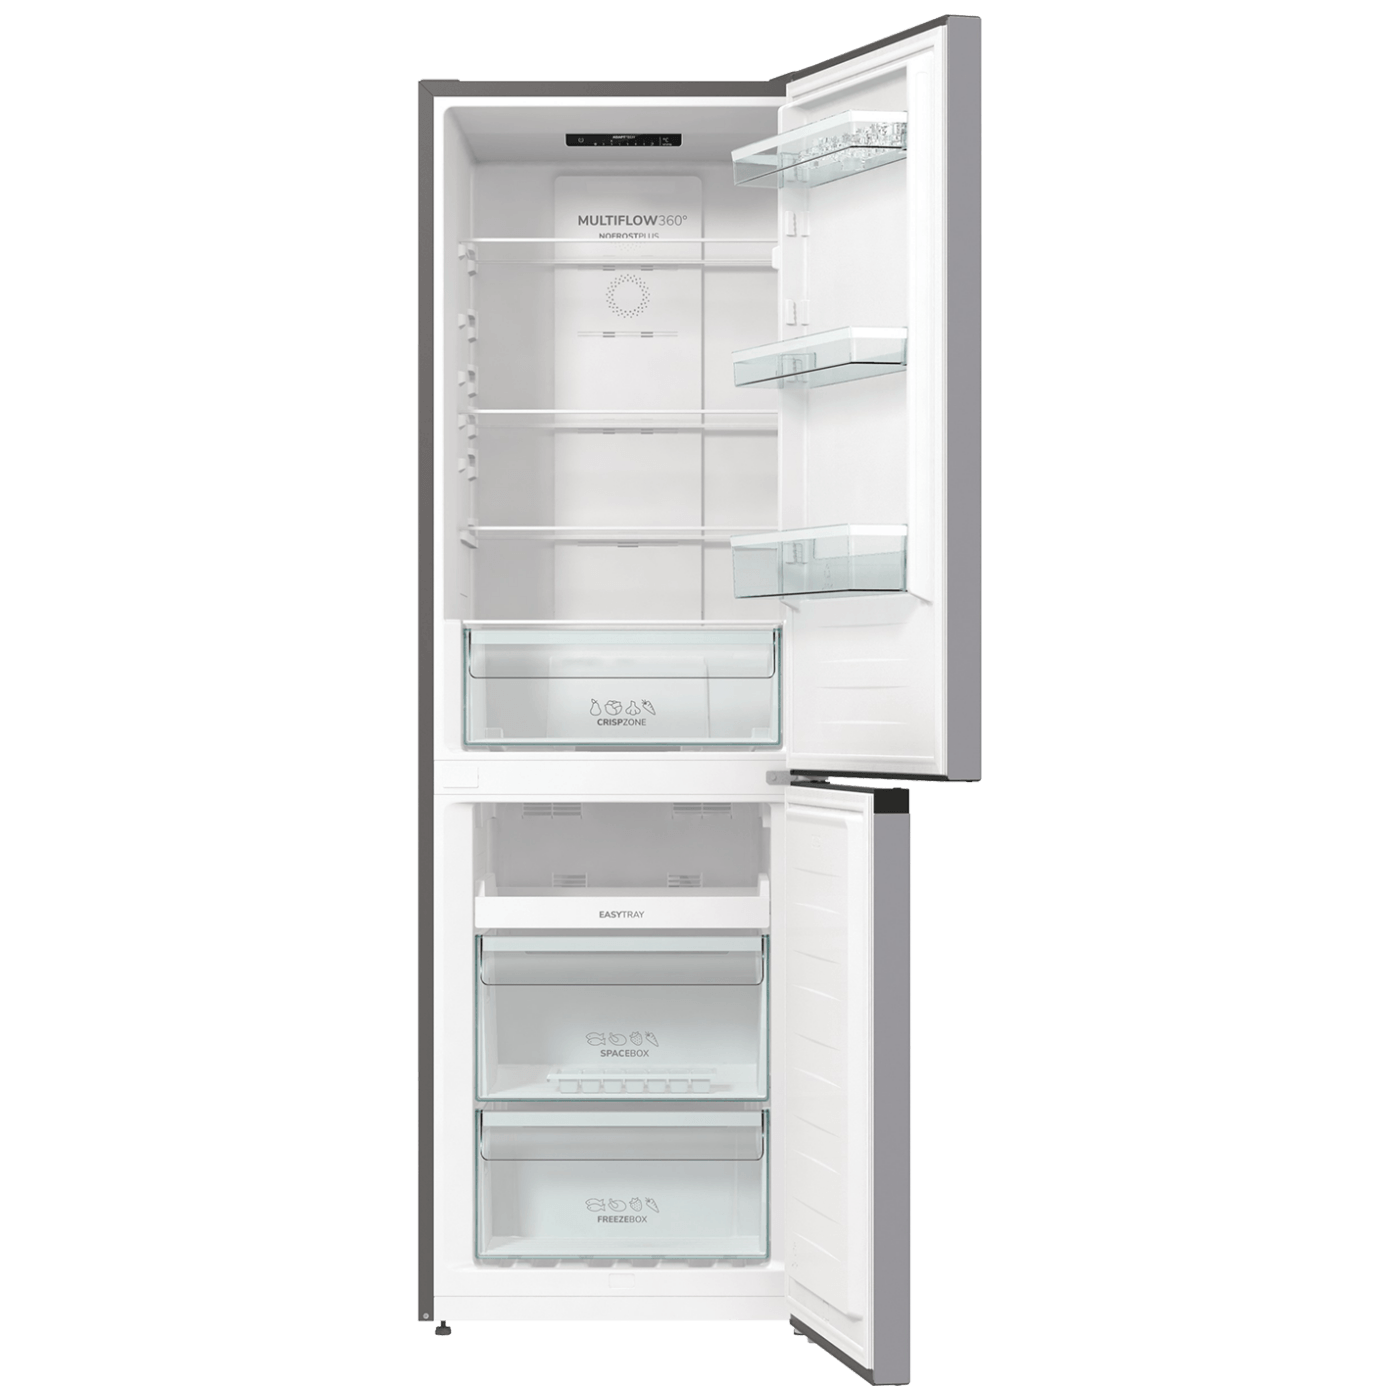 Frižider/Zamrzivač brutto zapremina 320 l, NoFrost Plus